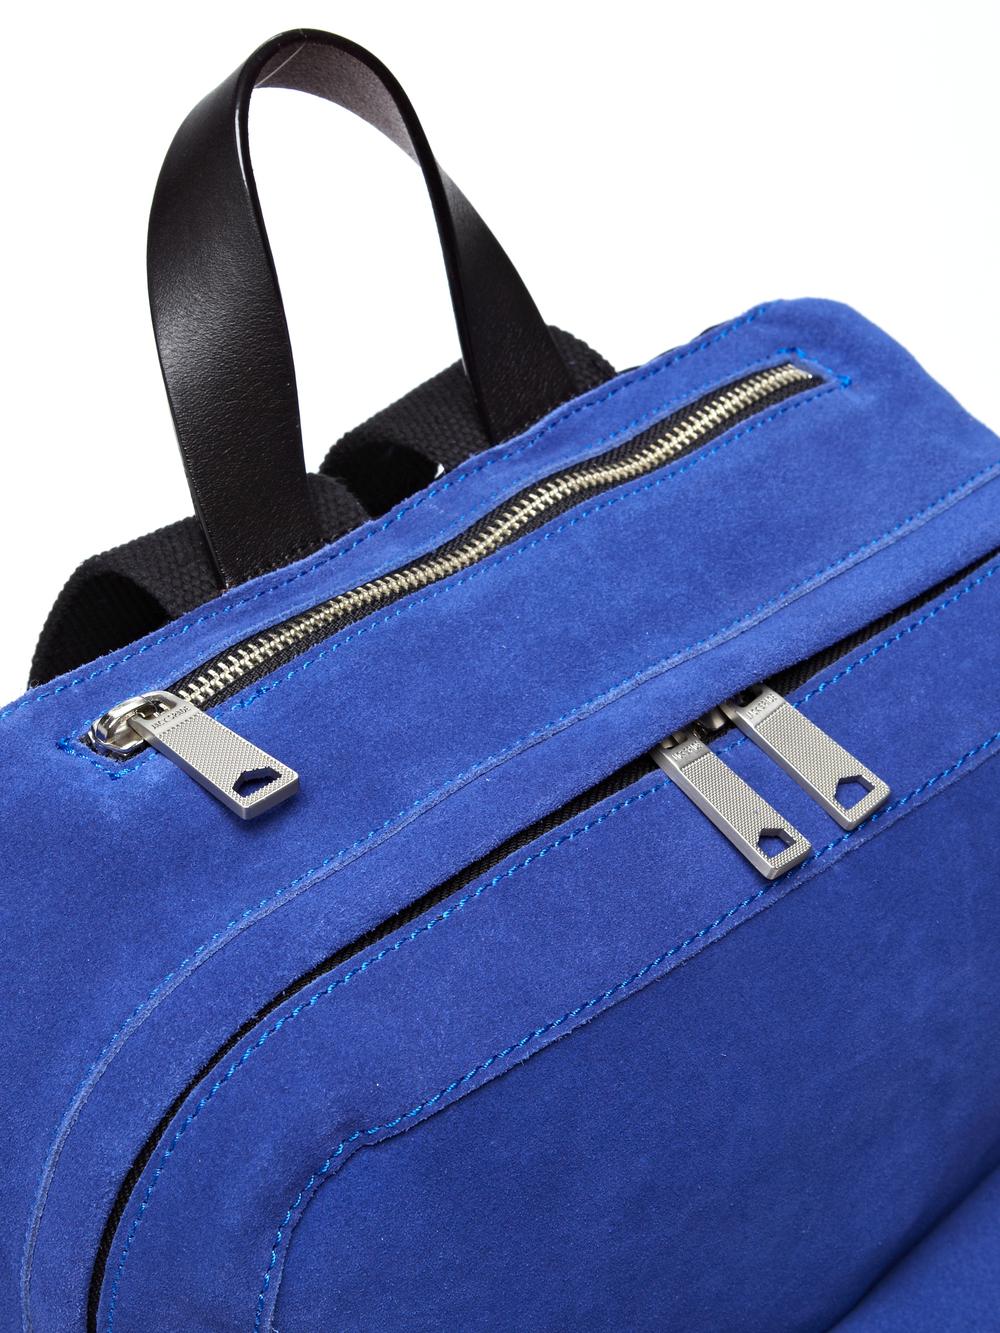 Backpack_DETAIL_155.jpg